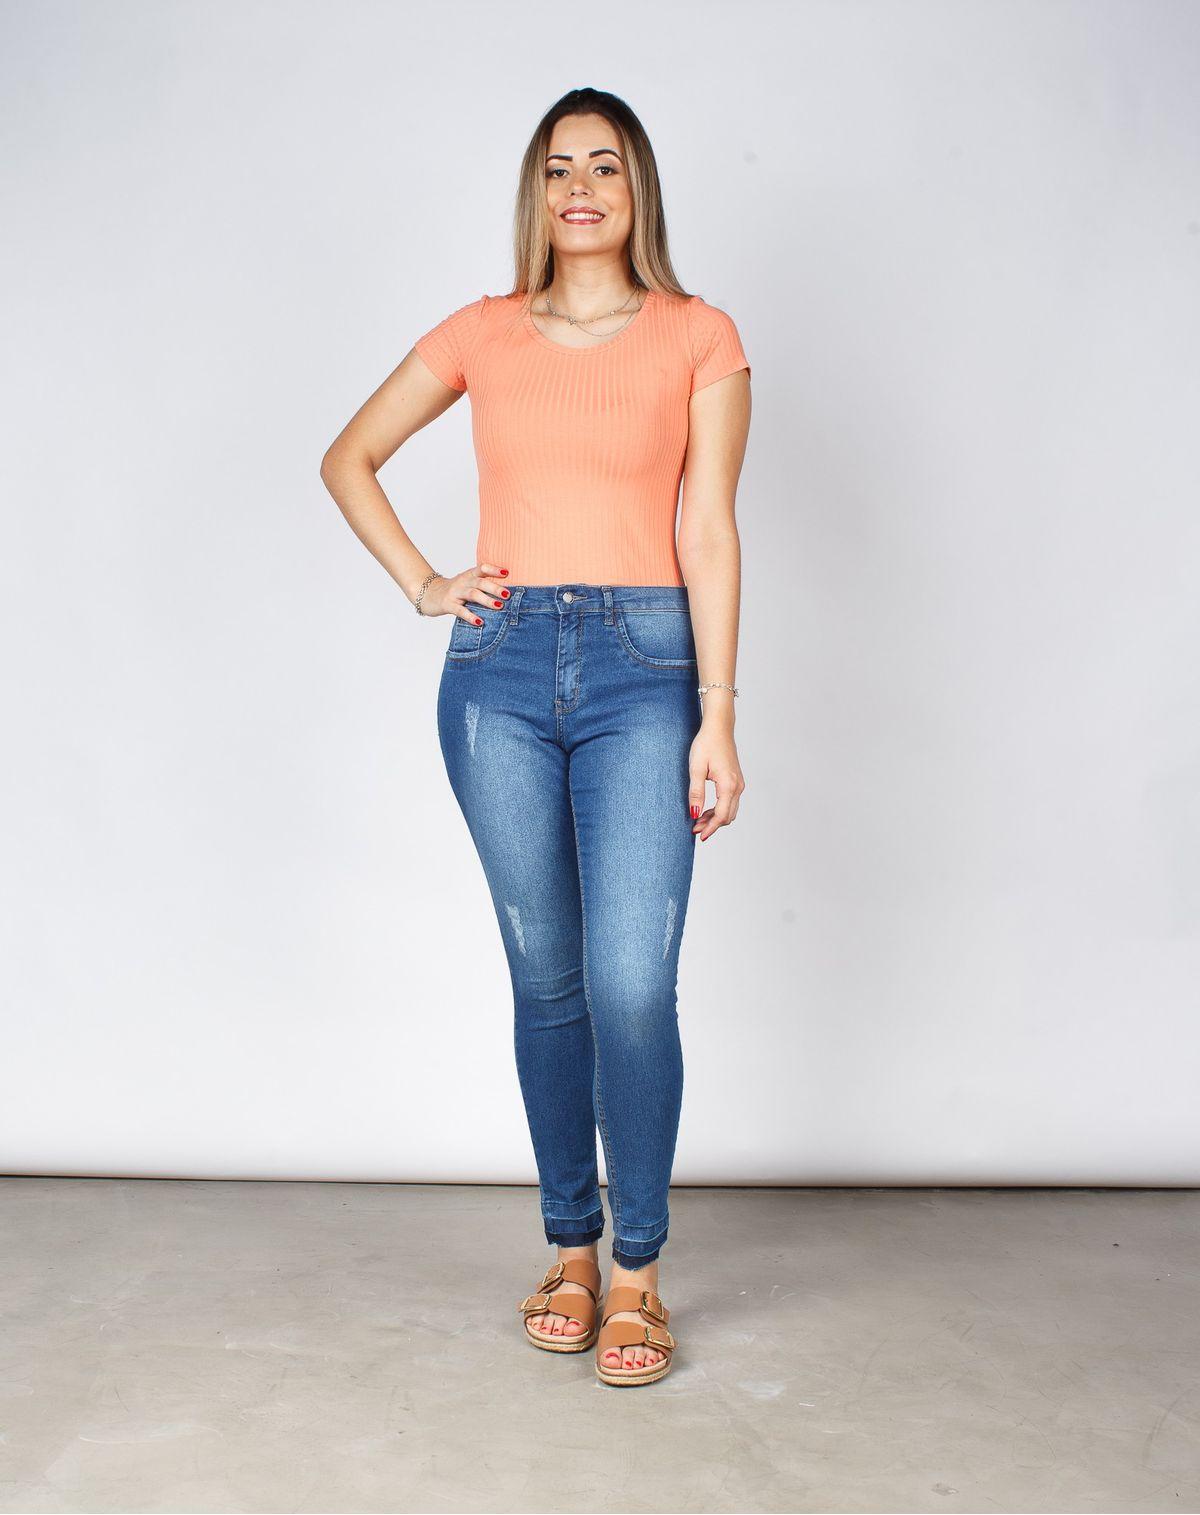 2050006235751-Calca-Denim-Skinny-Feminina-Barra-Sem-Costura-JEANS-36-1